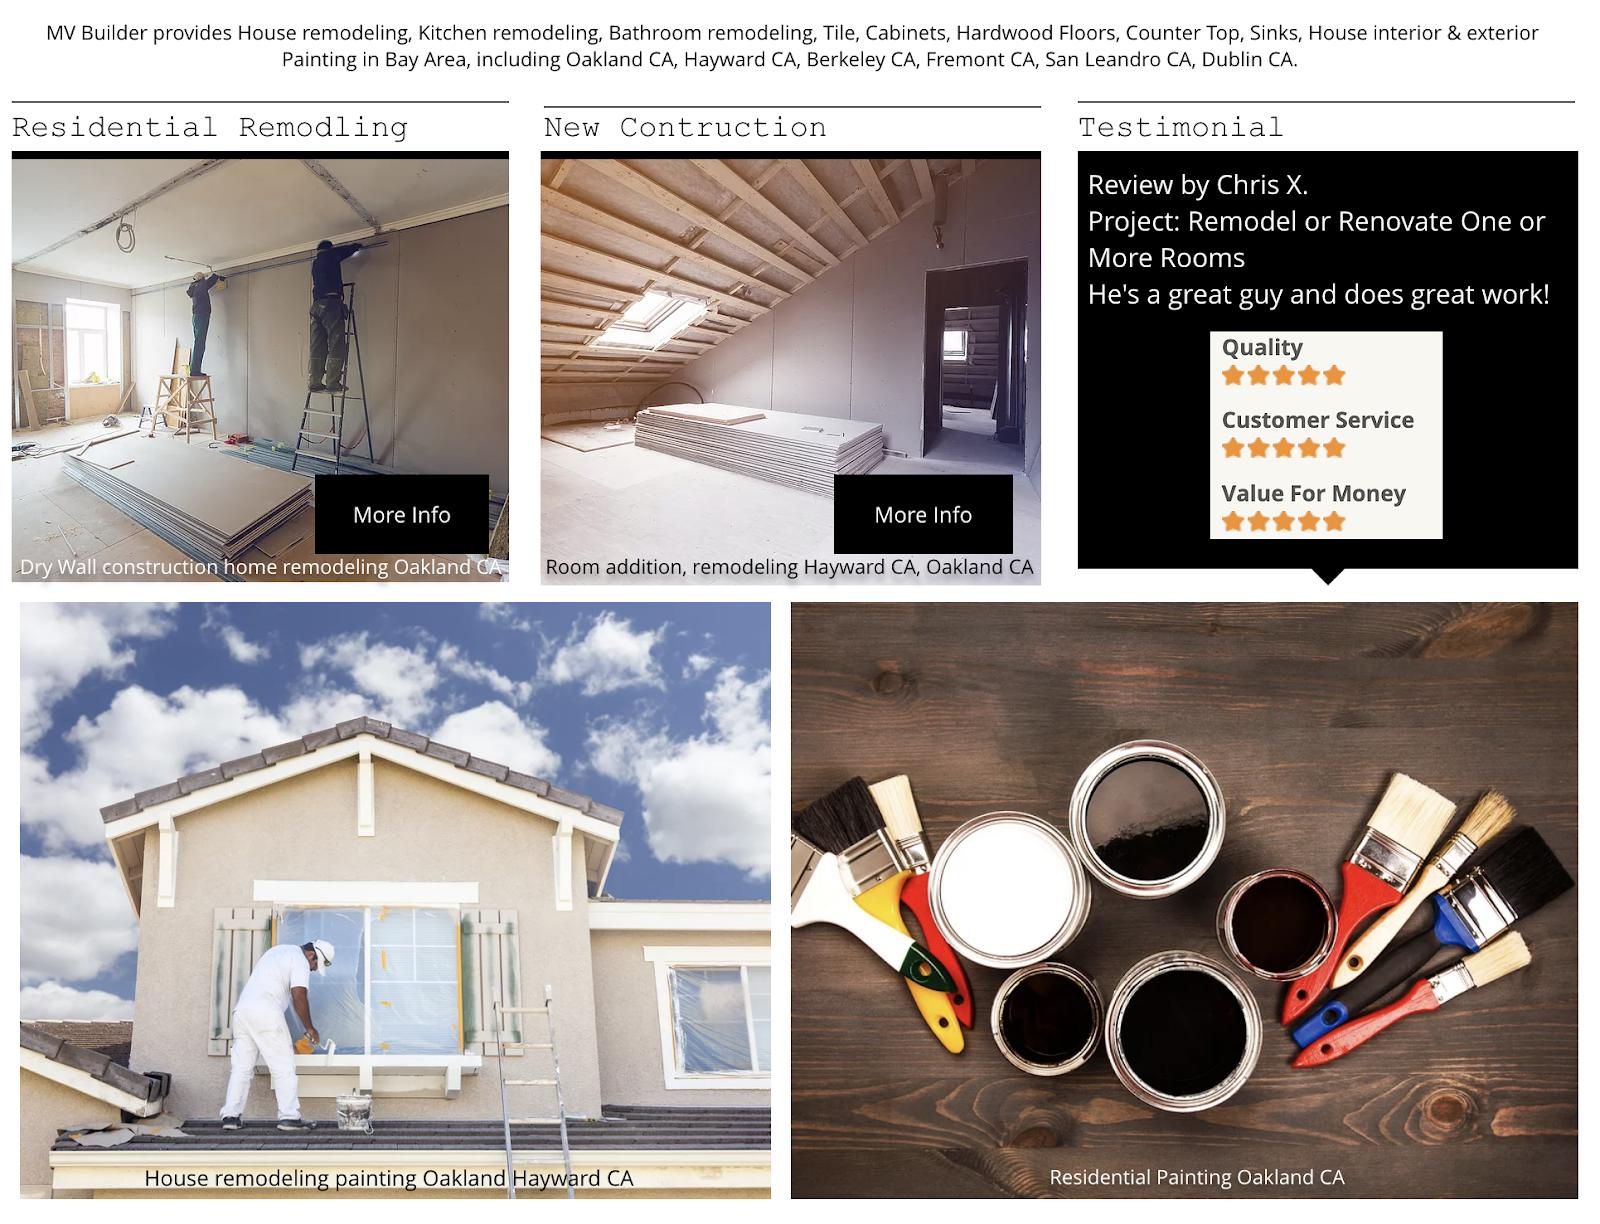 san jose ca seo marketing search engine marketing web design company near me in oakland ca for. Black Bedroom Furniture Sets. Home Design Ideas